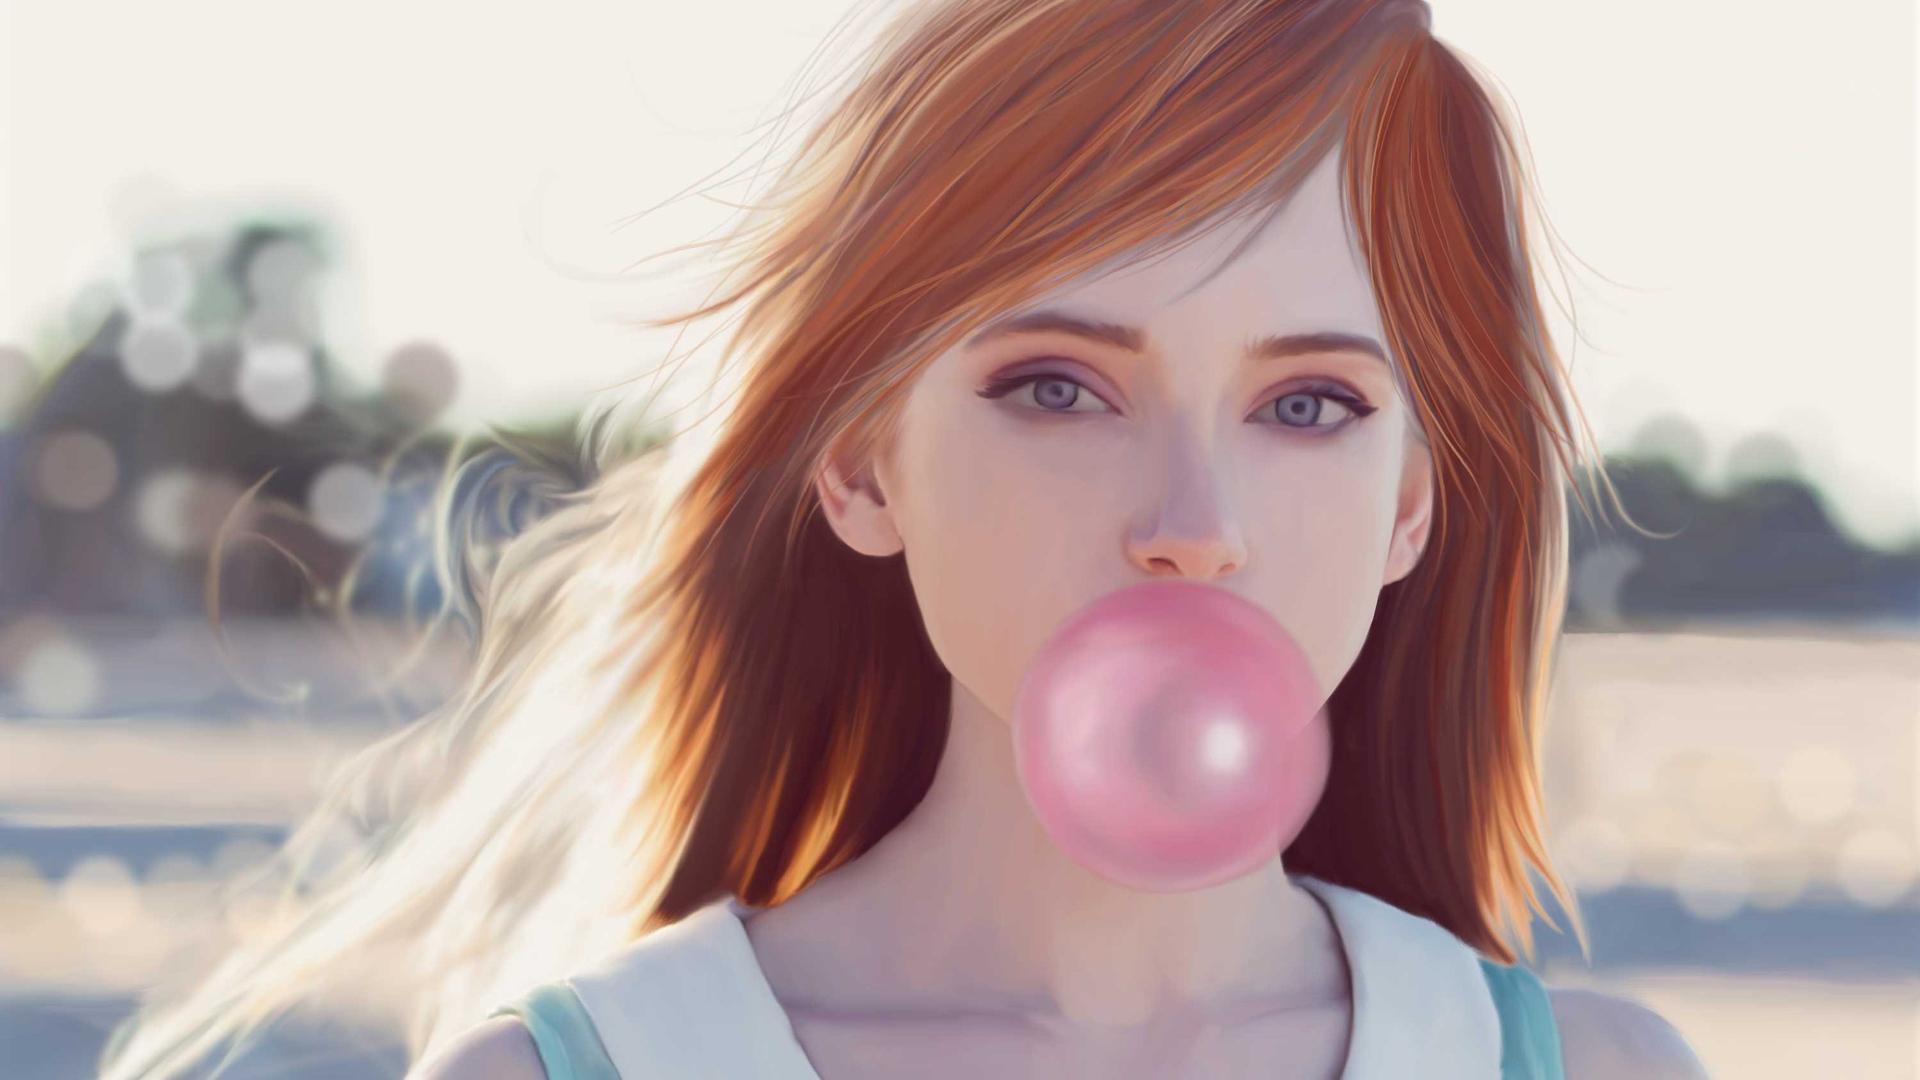 girl-blowing-bubble-gum-dk.jpg